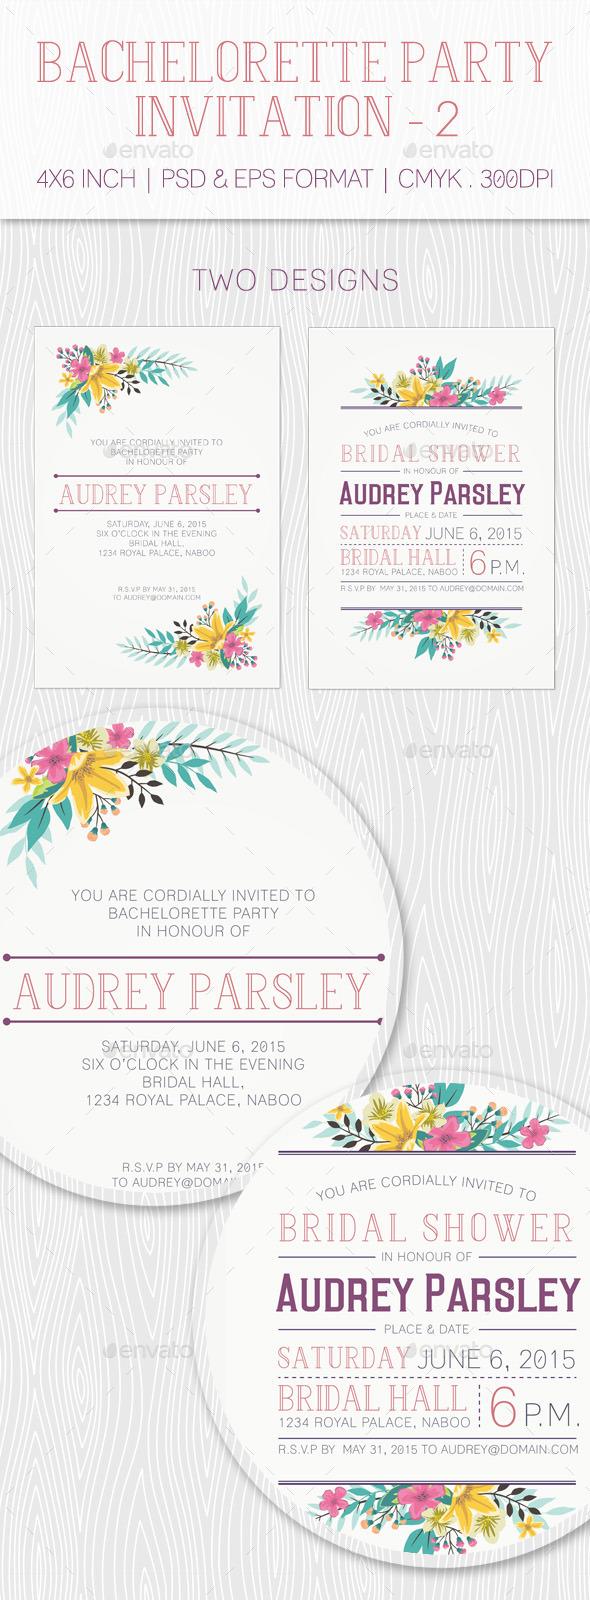 Bachelorette Party Invitation - 2 - Weddings Cards & Invites